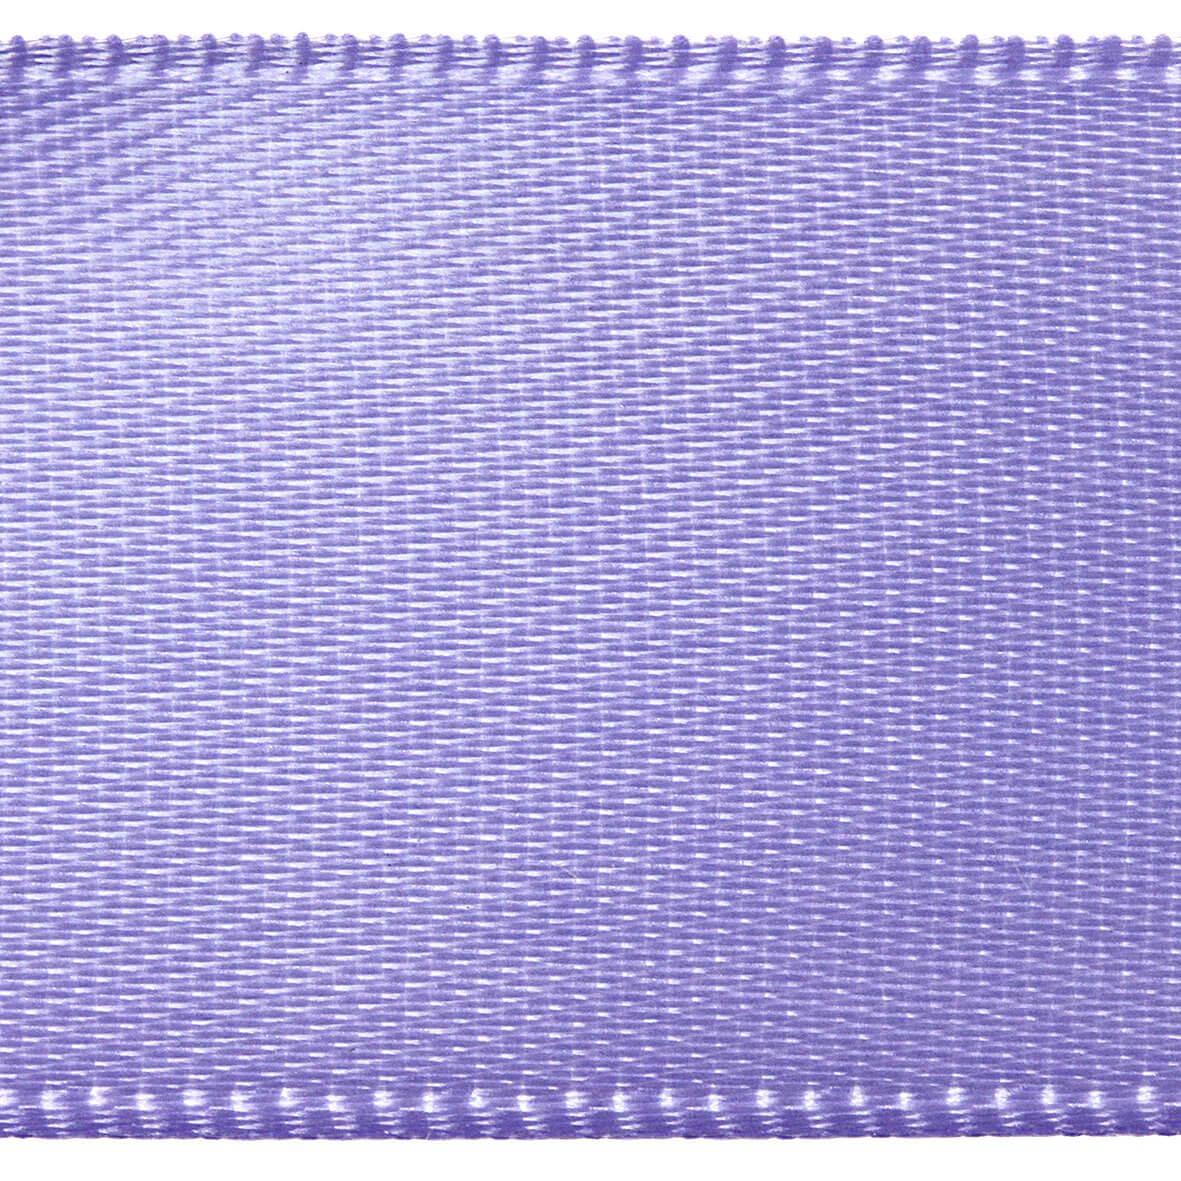 Hyacinth Club Green 23mm Double Faced Satin Ribbon